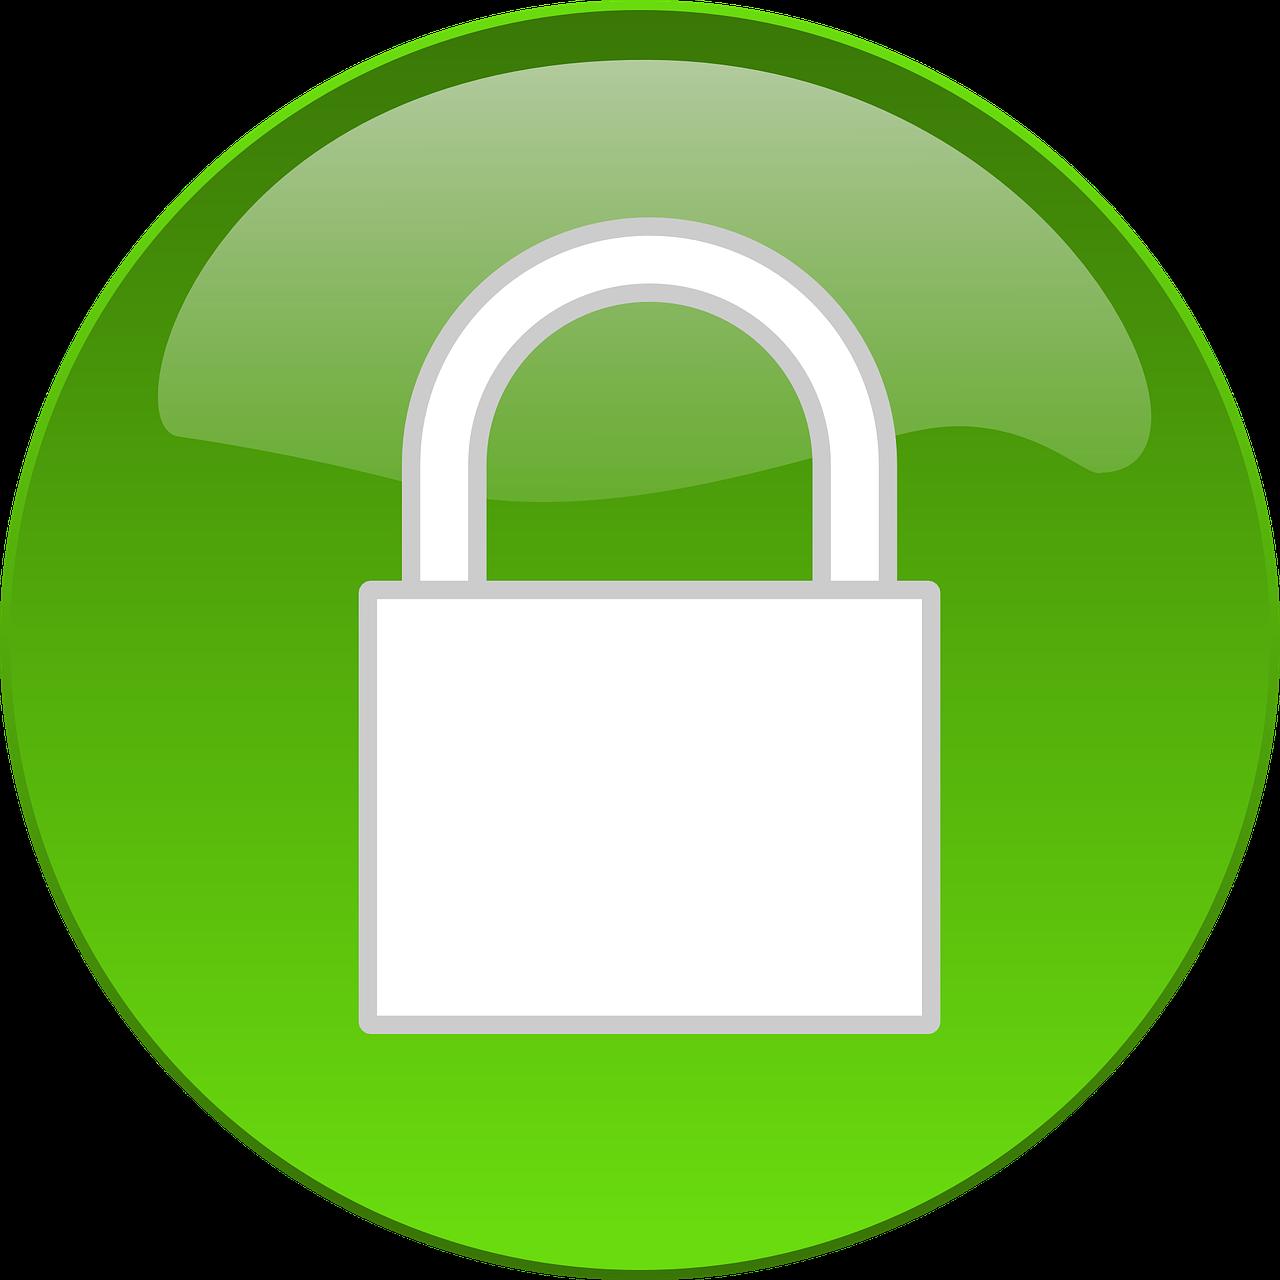 Lock clipart lockdown. Successful down drill mattacheese